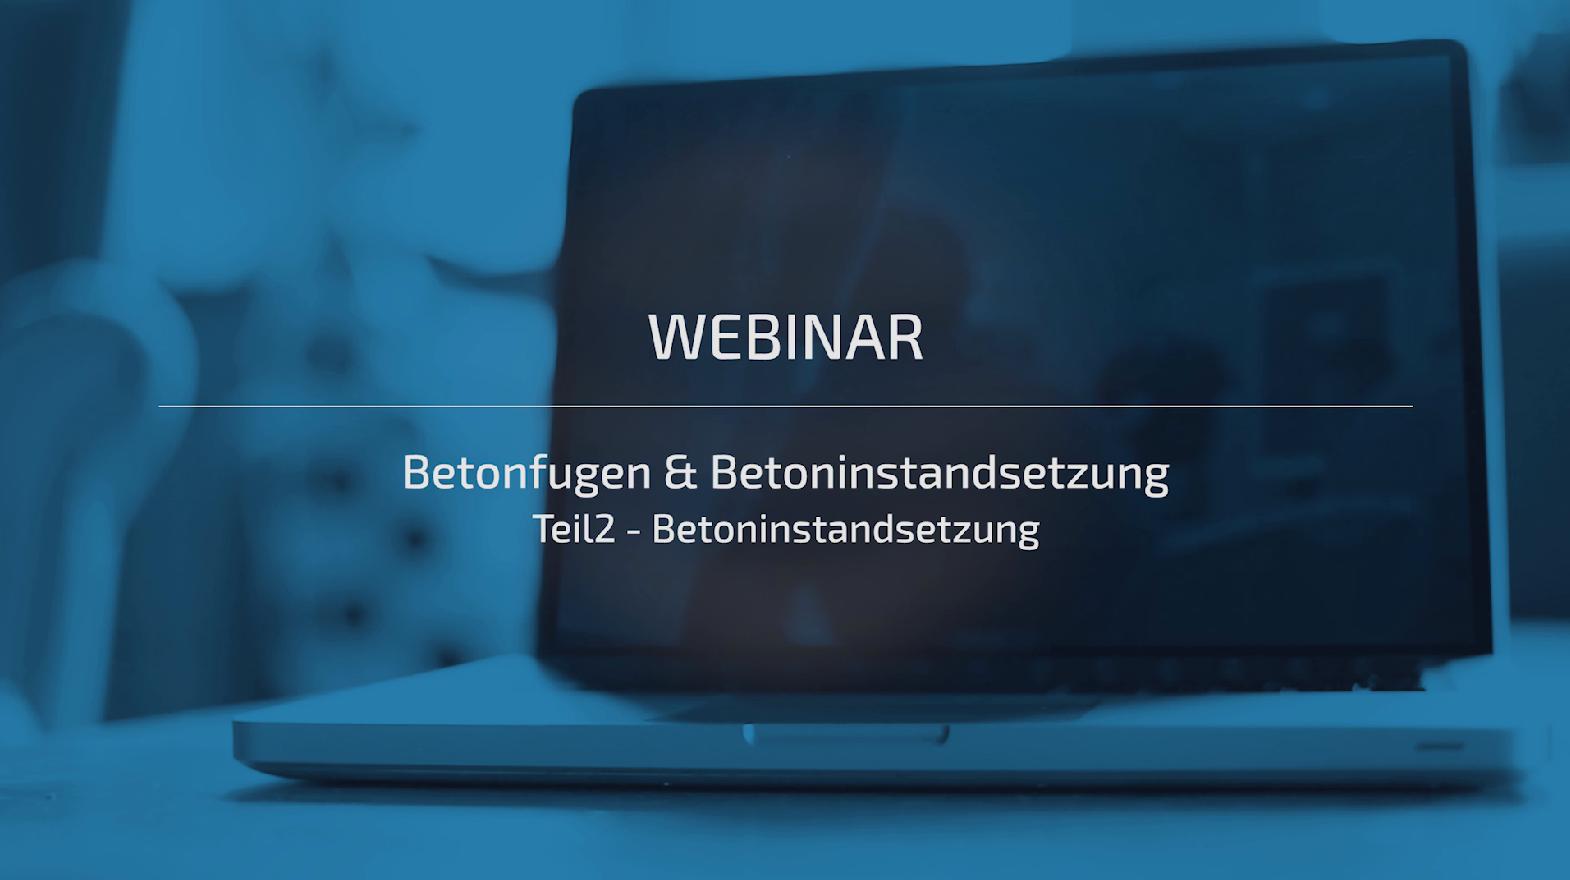 Webinar - Betonfugen & Betoninstandsetzung <br> Teil 2